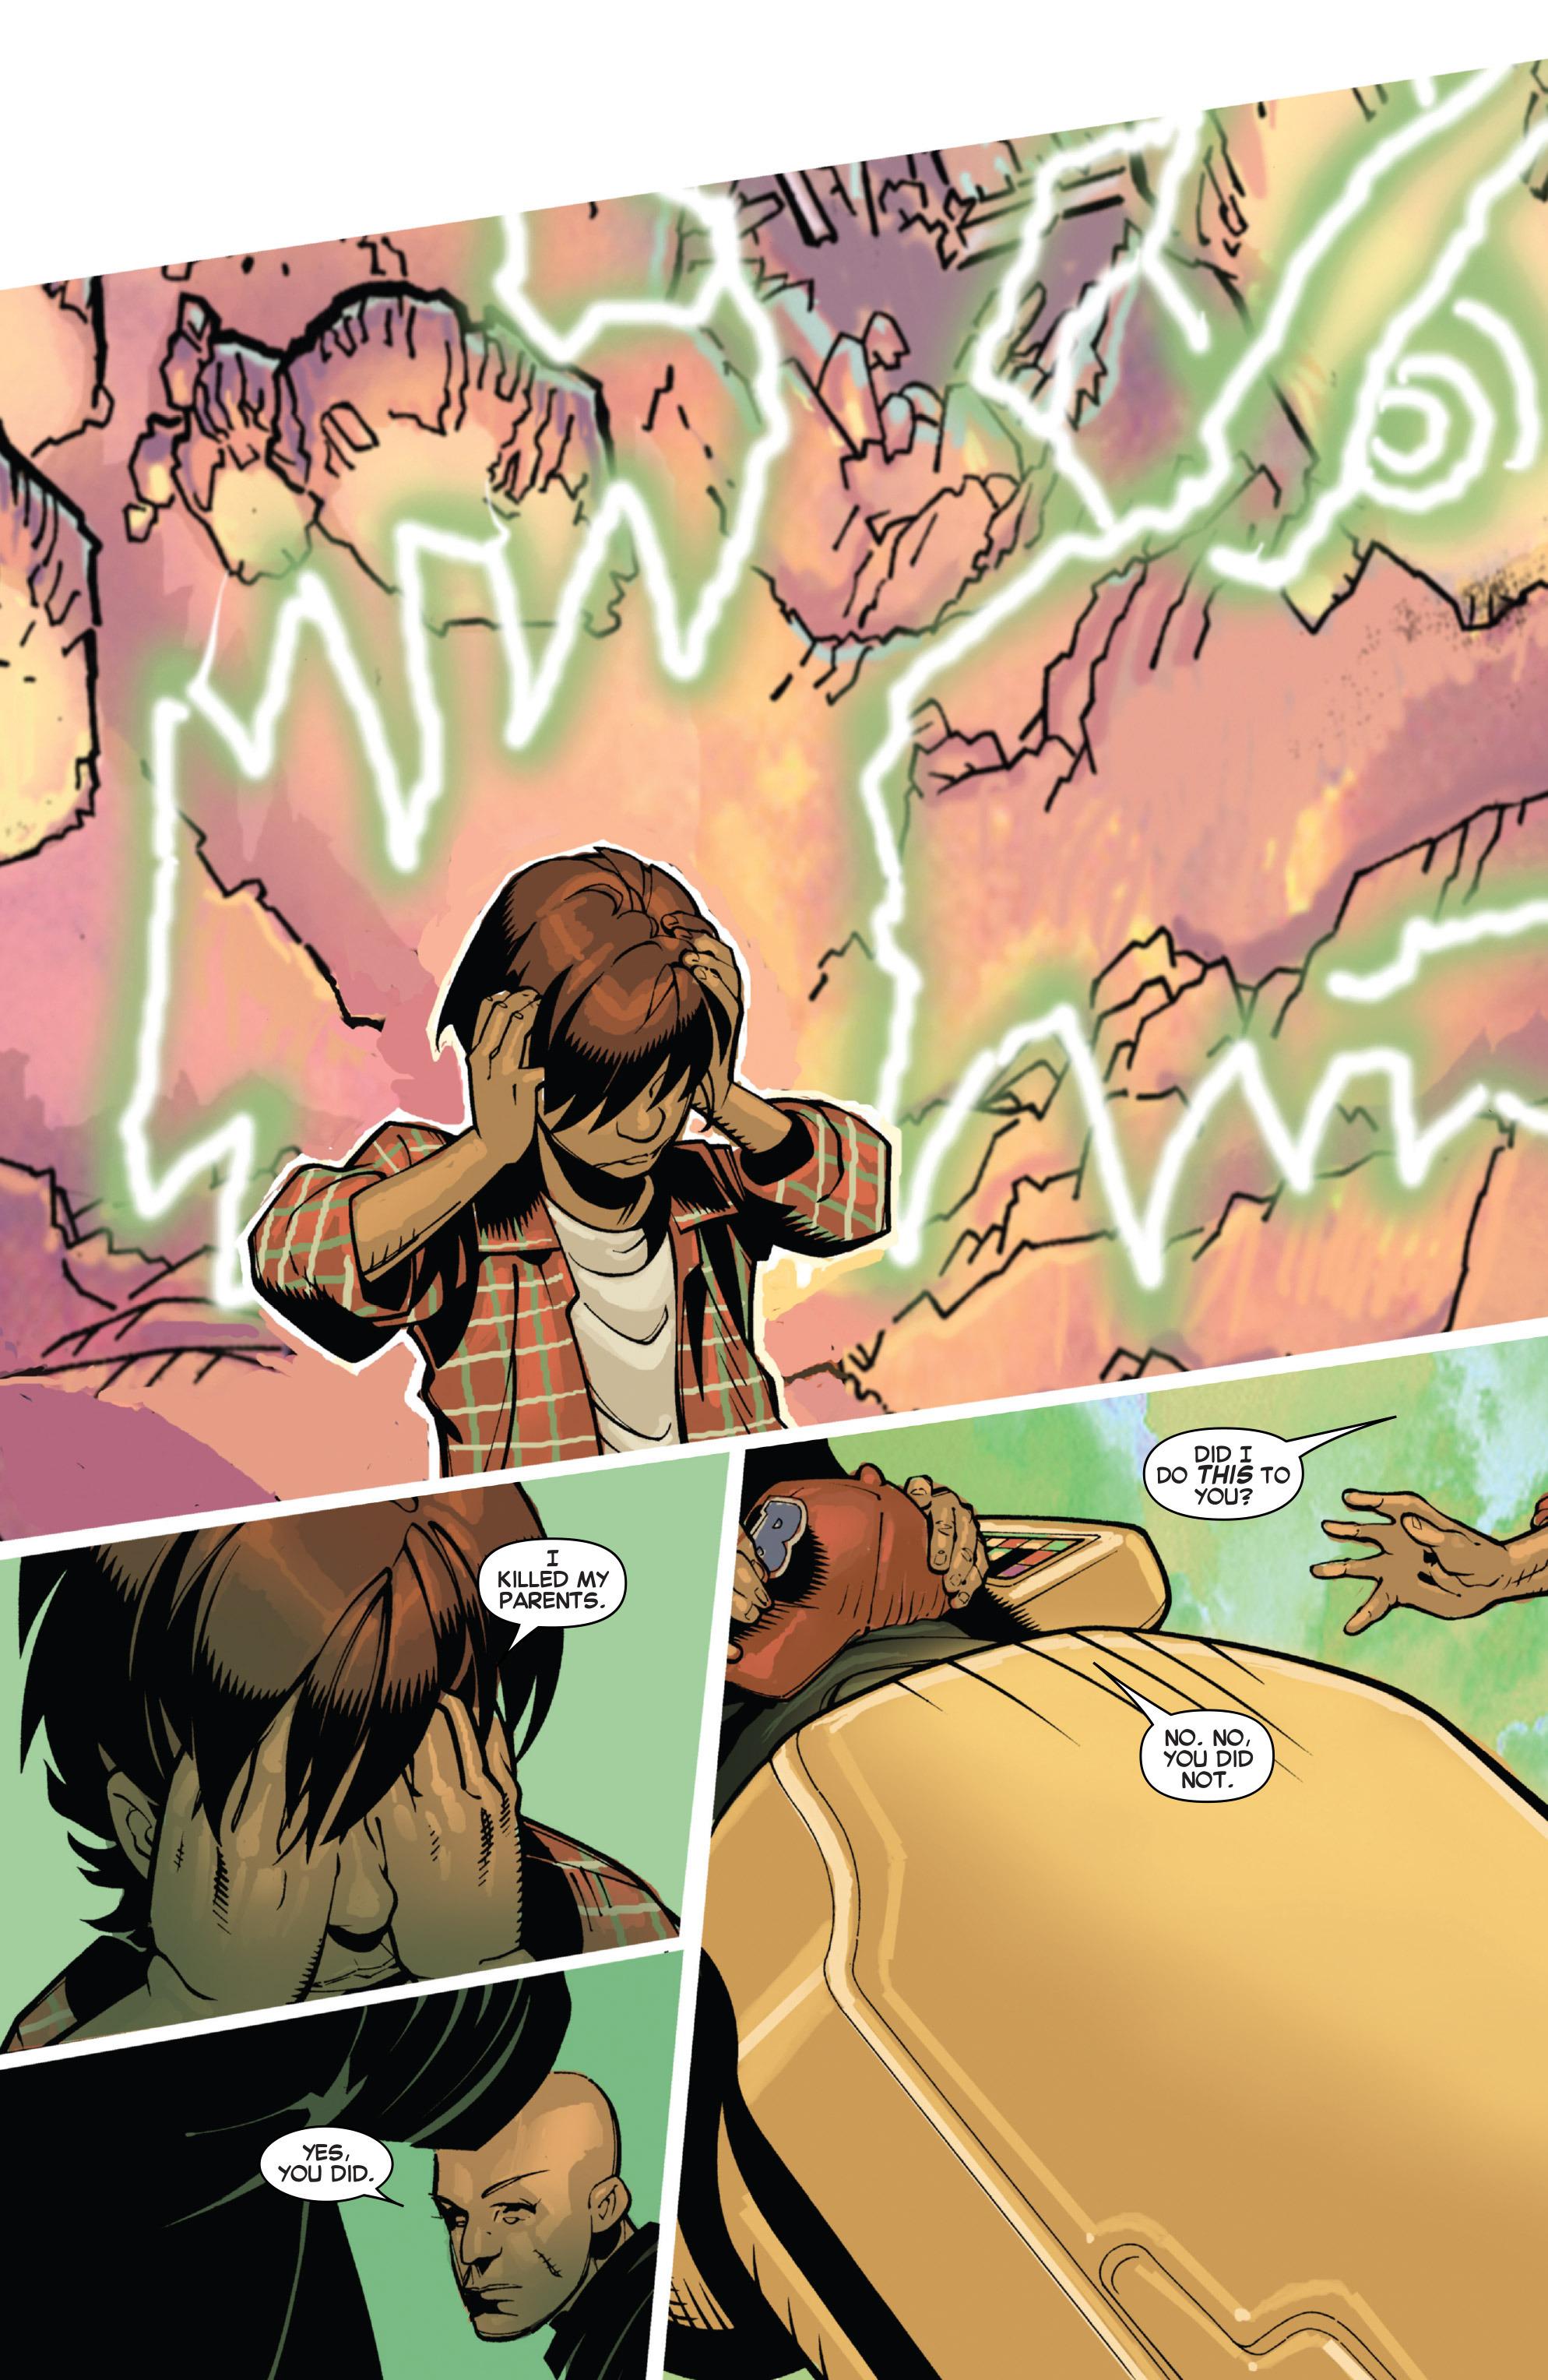 Read online Uncanny X-Men (2013) comic -  Issue # _TPB 4 - vs. S.H.I.E.L.D - 139